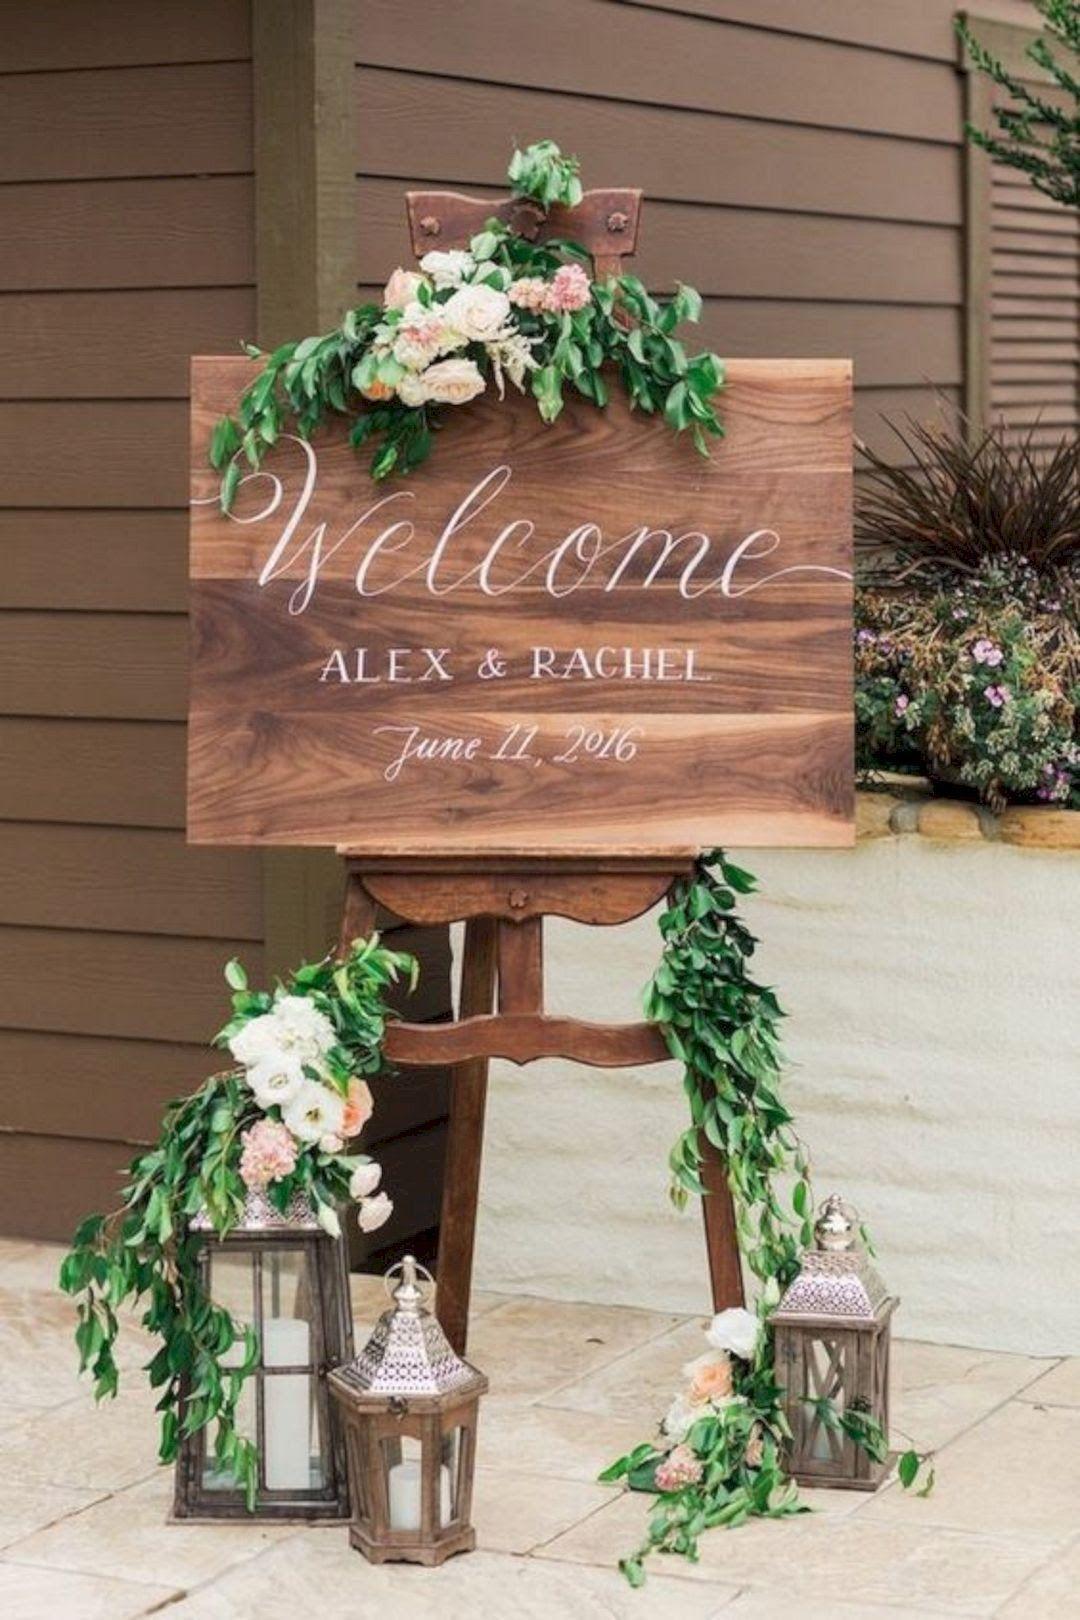 Wedding gate and stage decoration   Beautiful Wedding Decorating Ideas  Presley baptism  Pinterest